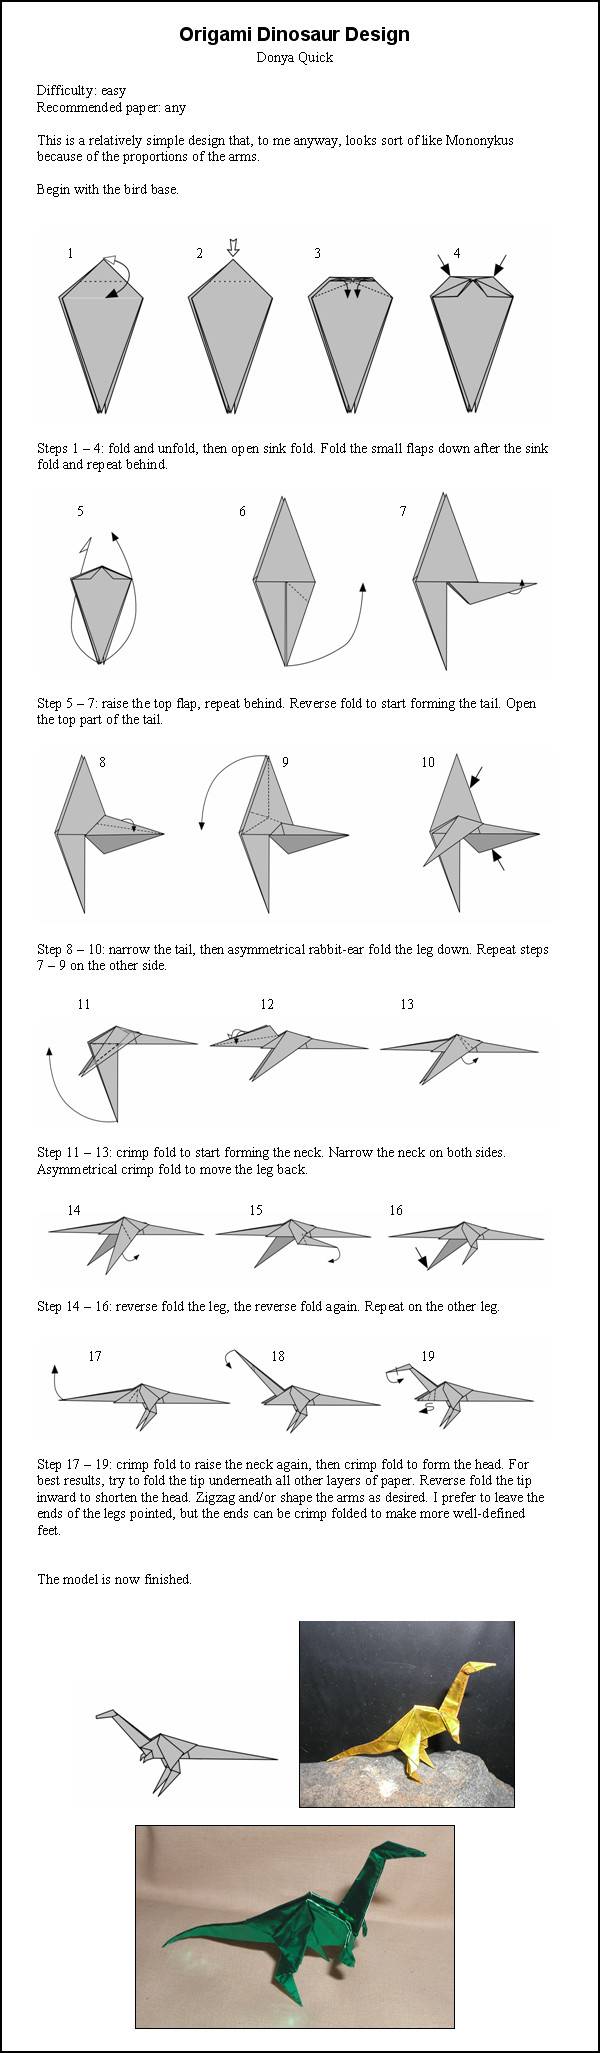 Origami Dinosaur Instructions by DonyaQuick on DeviantArt - photo#4